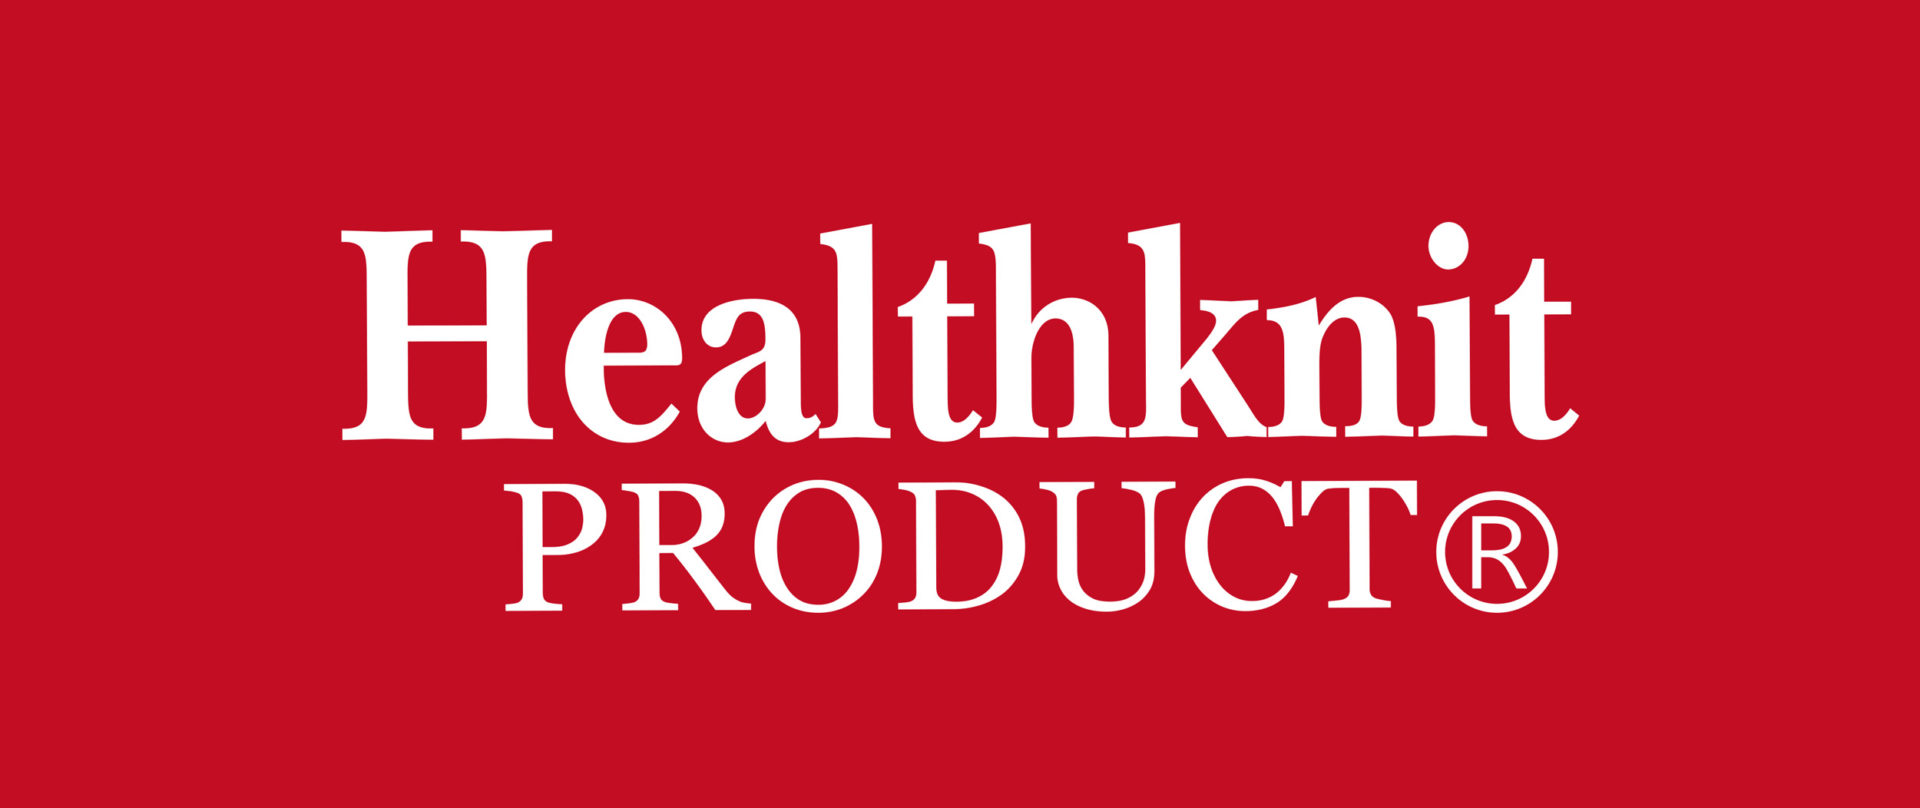 Healthknit Product ロゴ